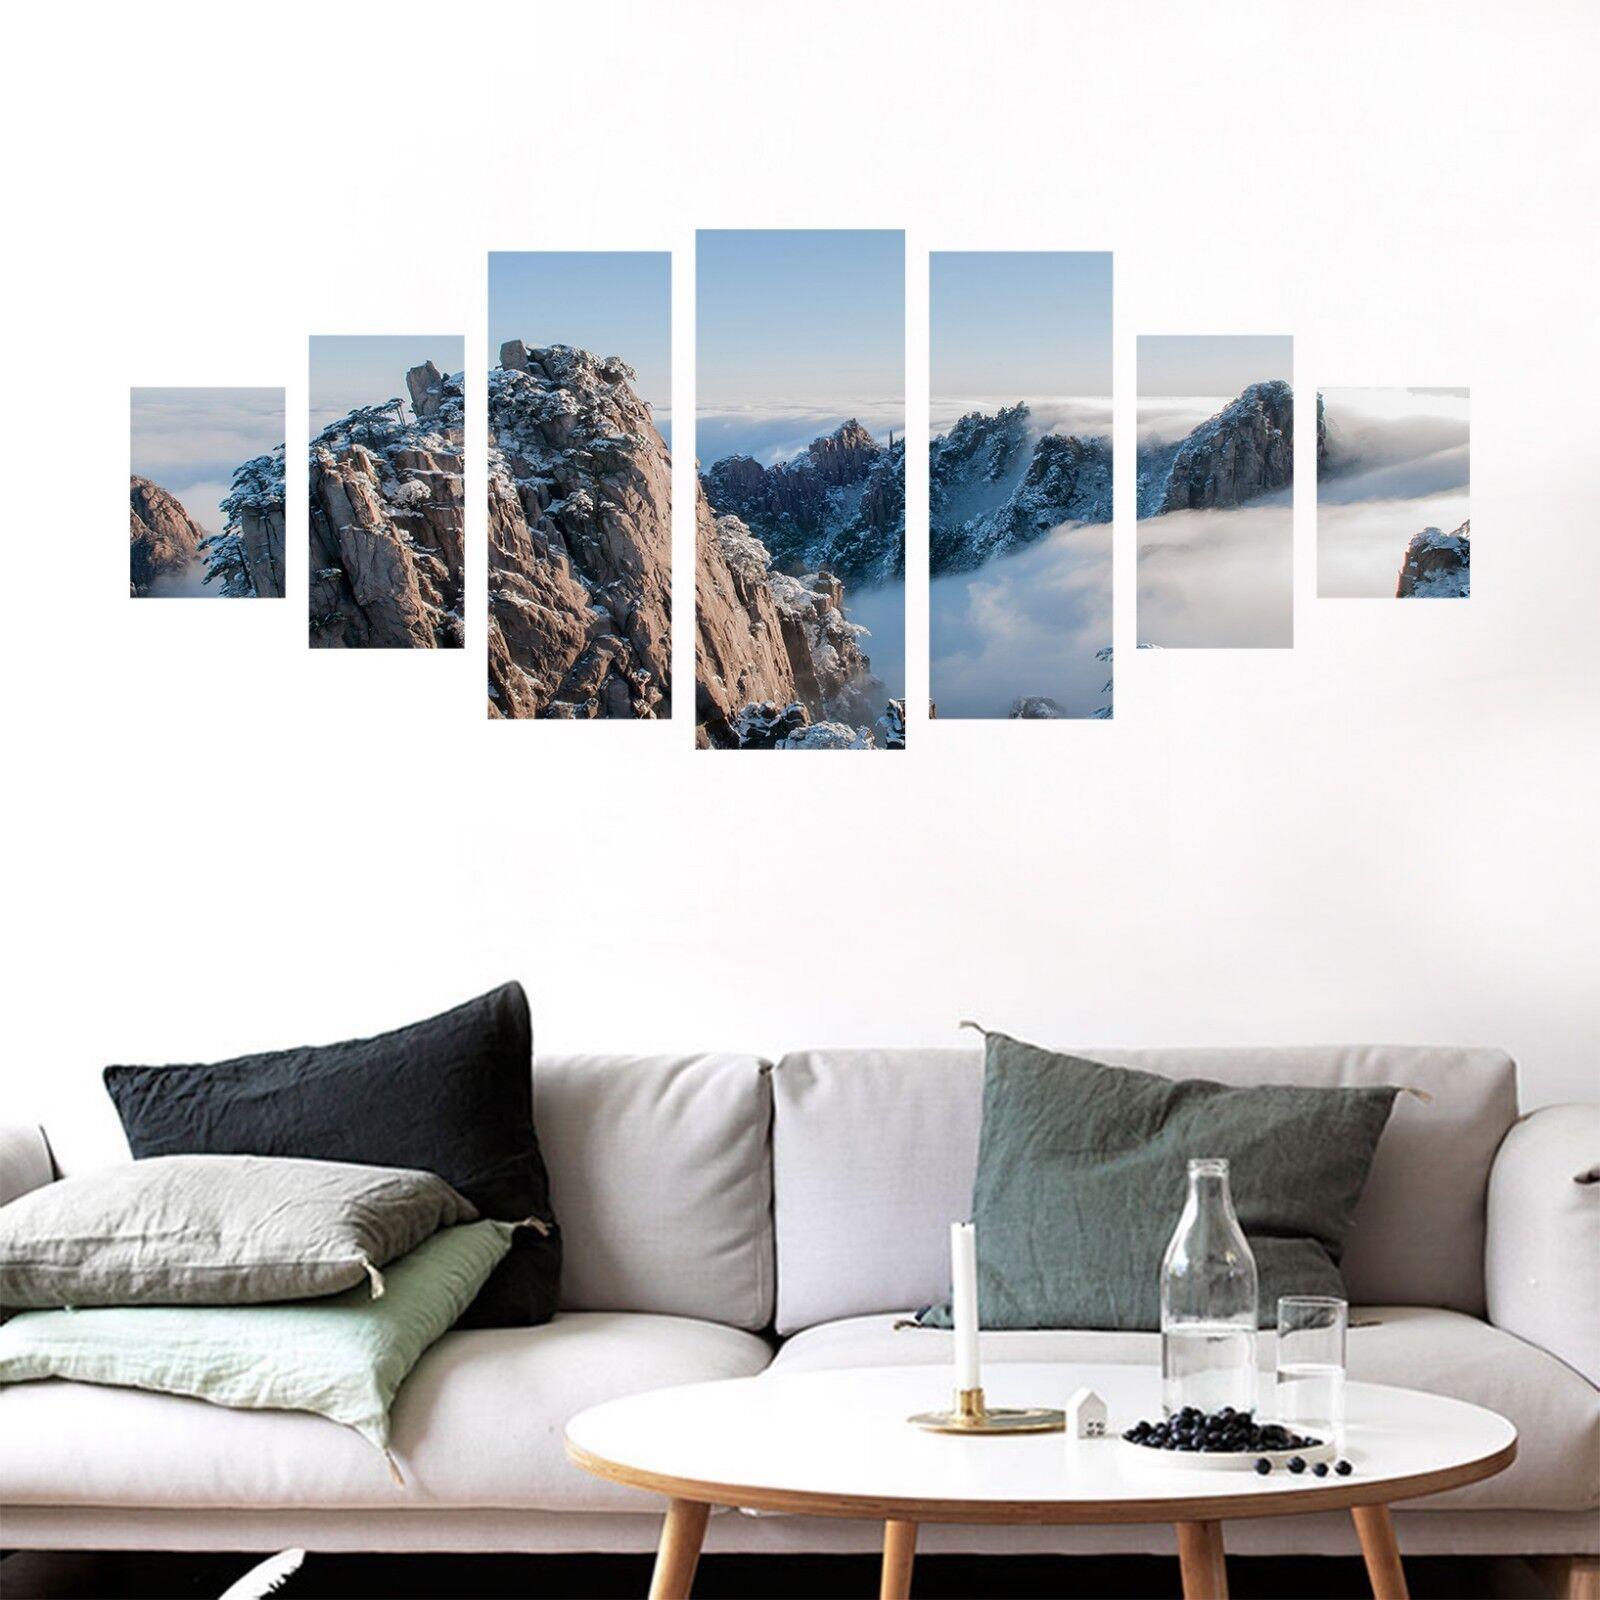 3D Mountain 839 Unframed Drucken Wand Papier Decal Wand Deco Innen AJ Wand Jenny